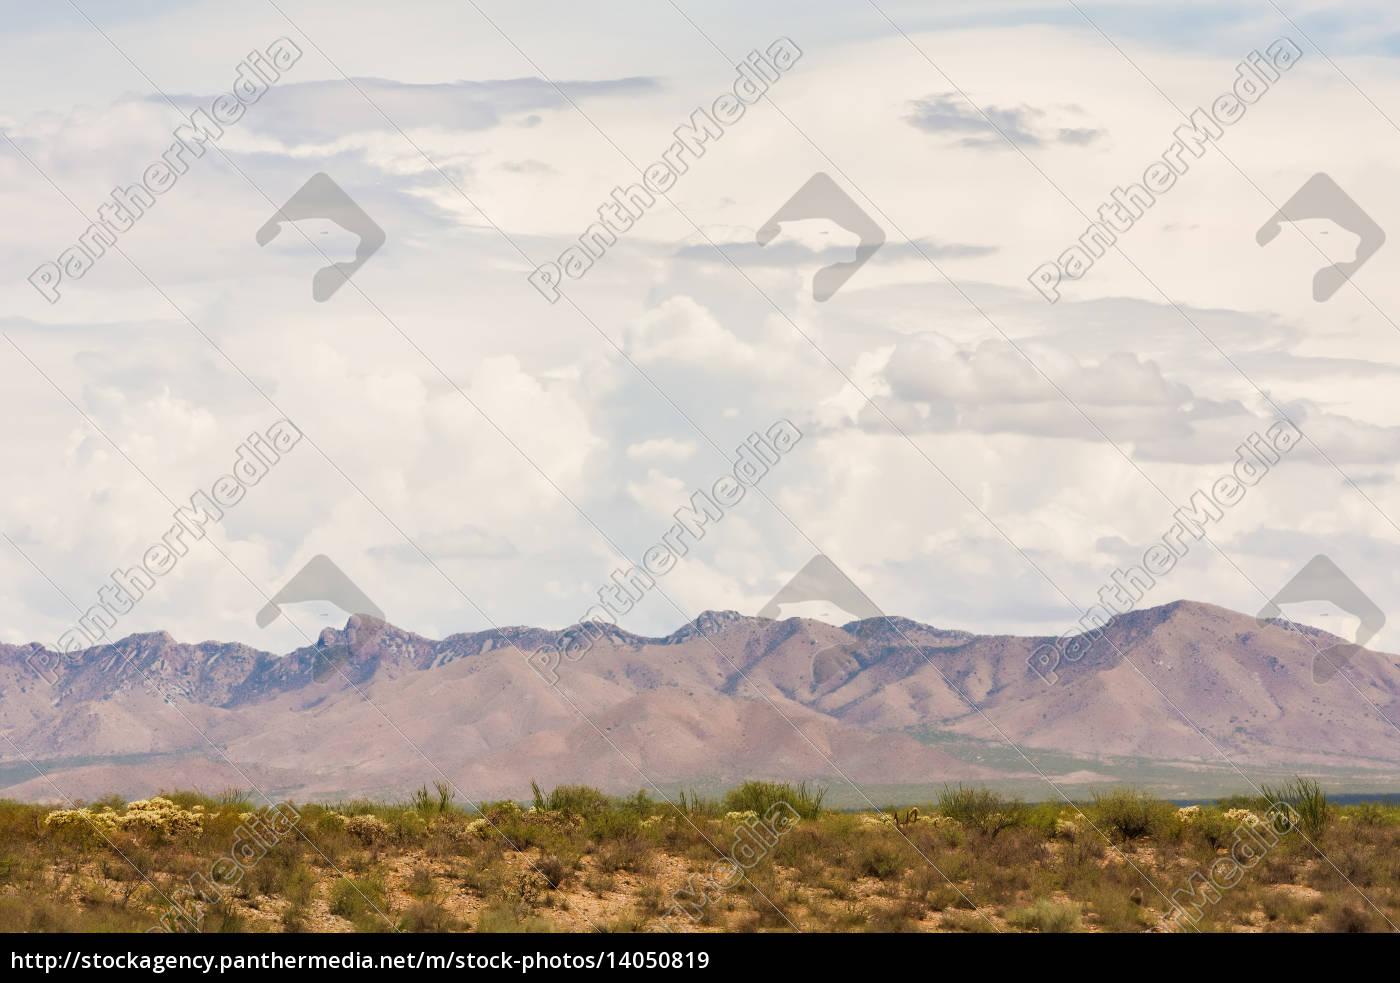 arizona, monsoon, clouds, above, mountains - 14050819